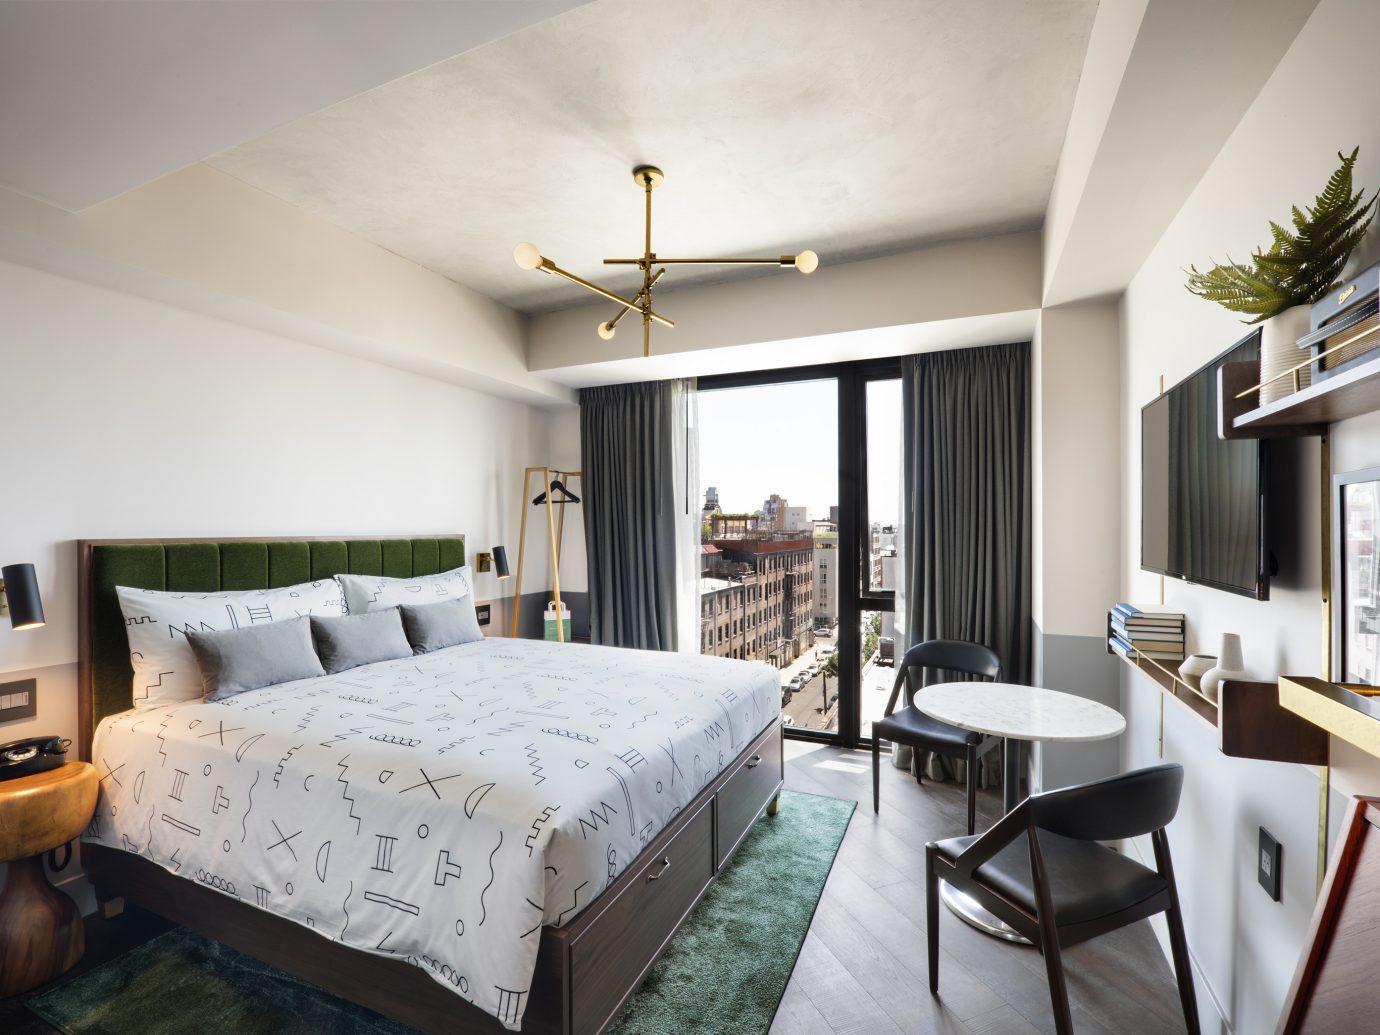 Bedroom at the Hoxton Williamsburg